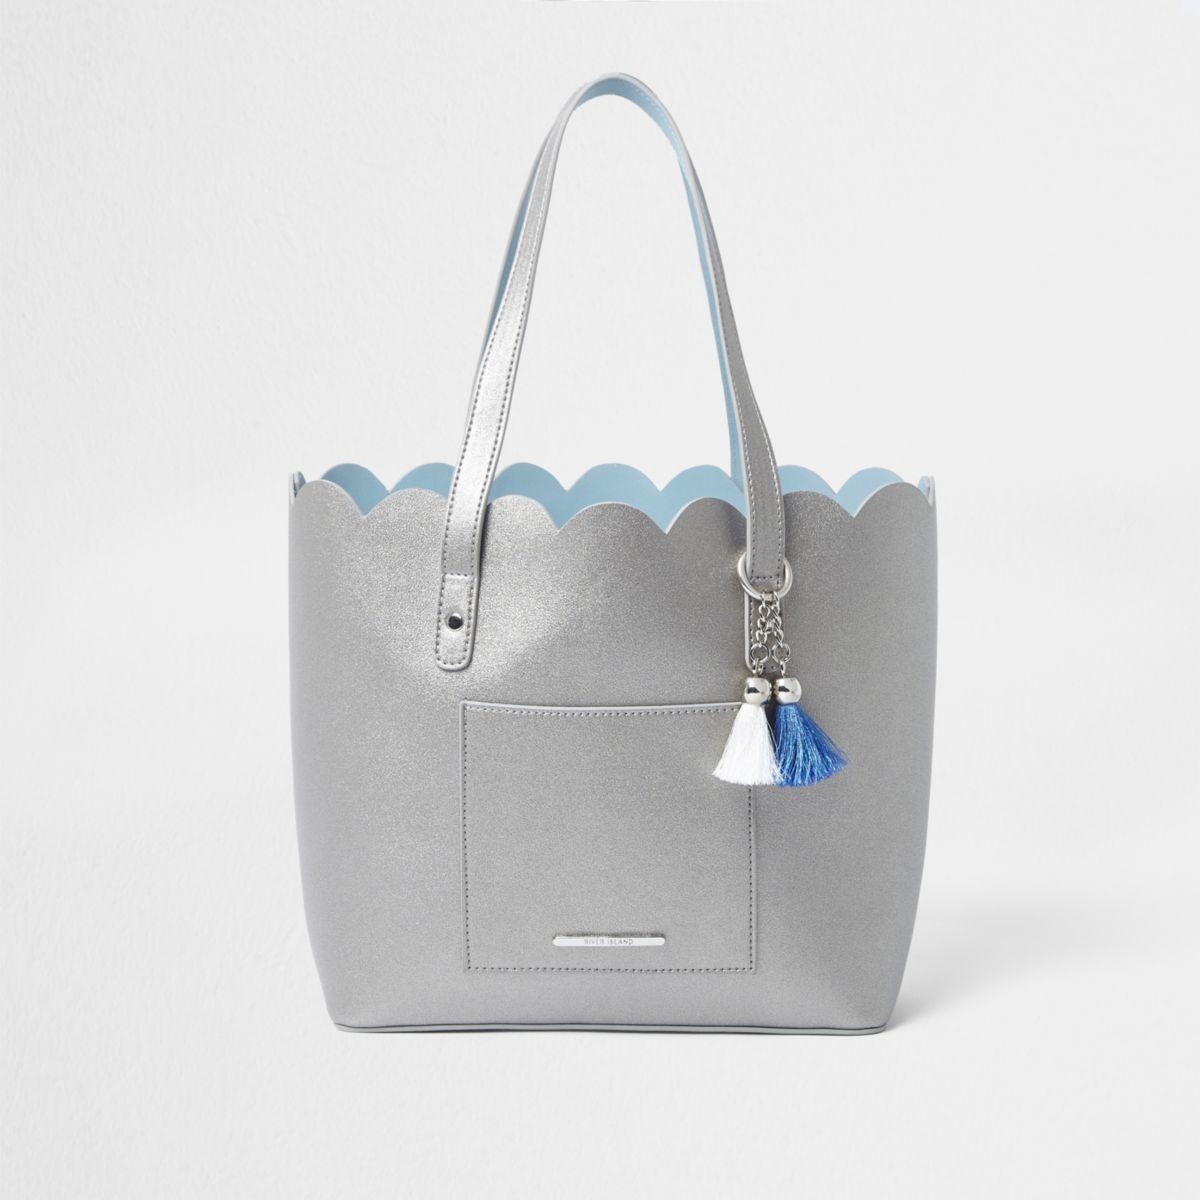 Girls silver scallop shopper tote bag